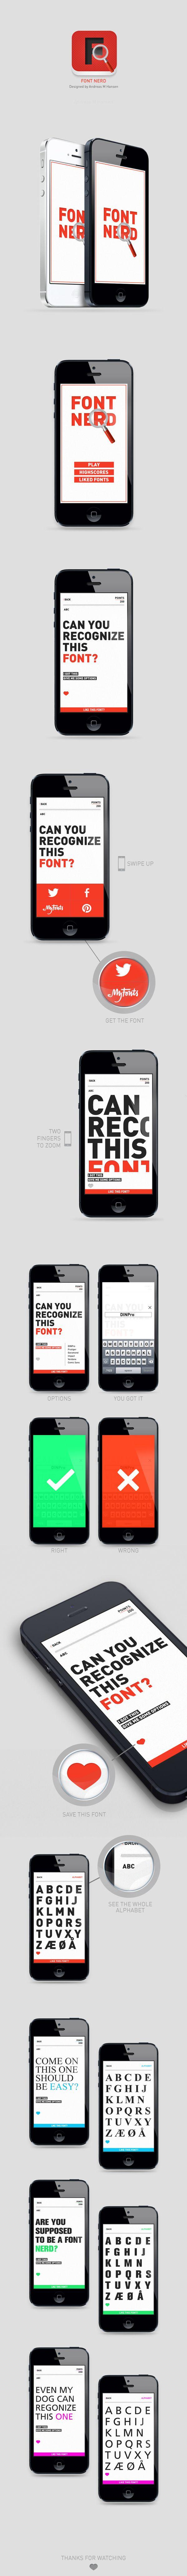 #Font Nerd by Andreas M Hansen, via #Behance #Mobile #App